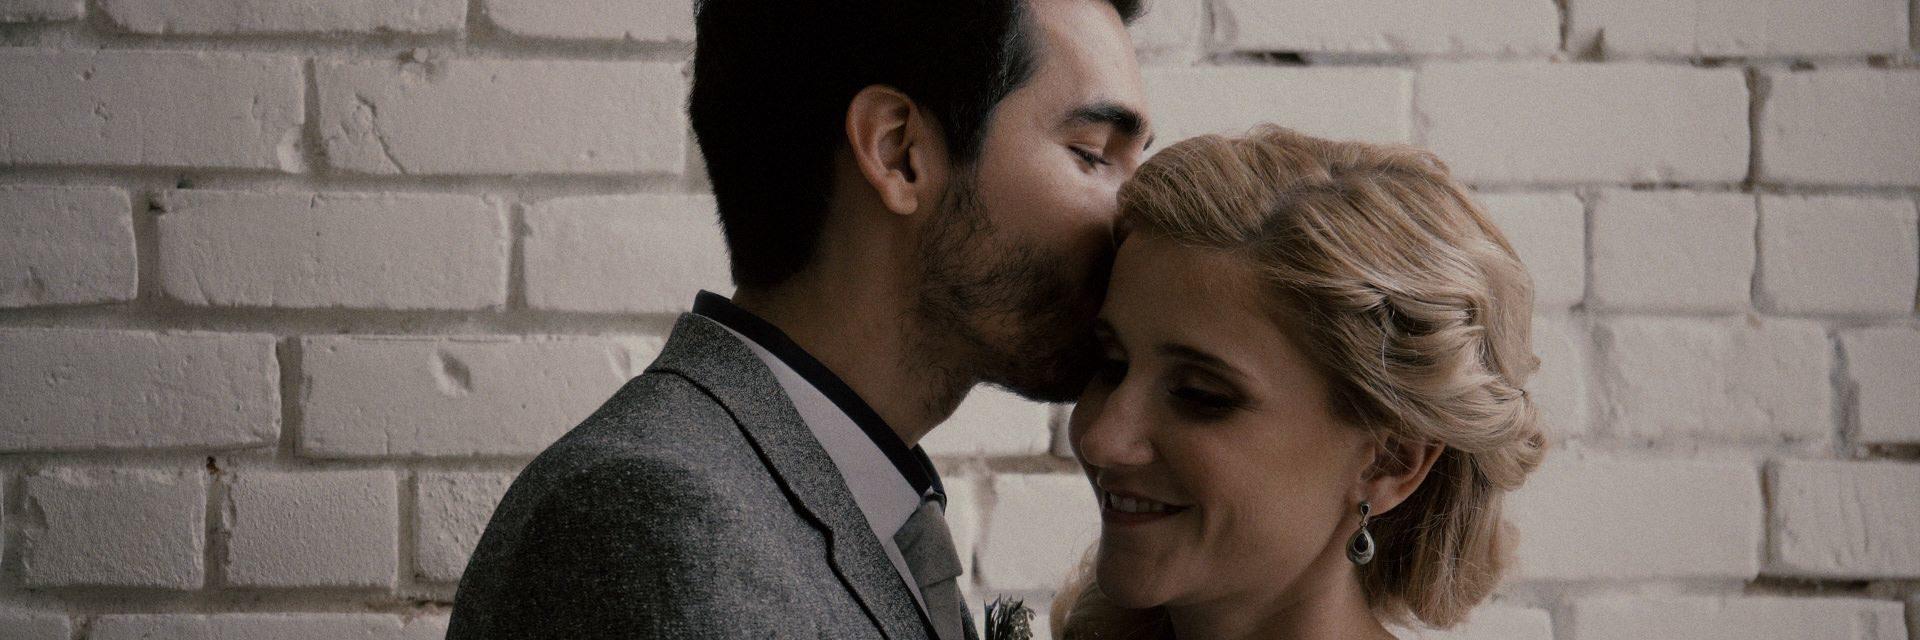 Barcelona-wedding-videographer-cinemate-films-03